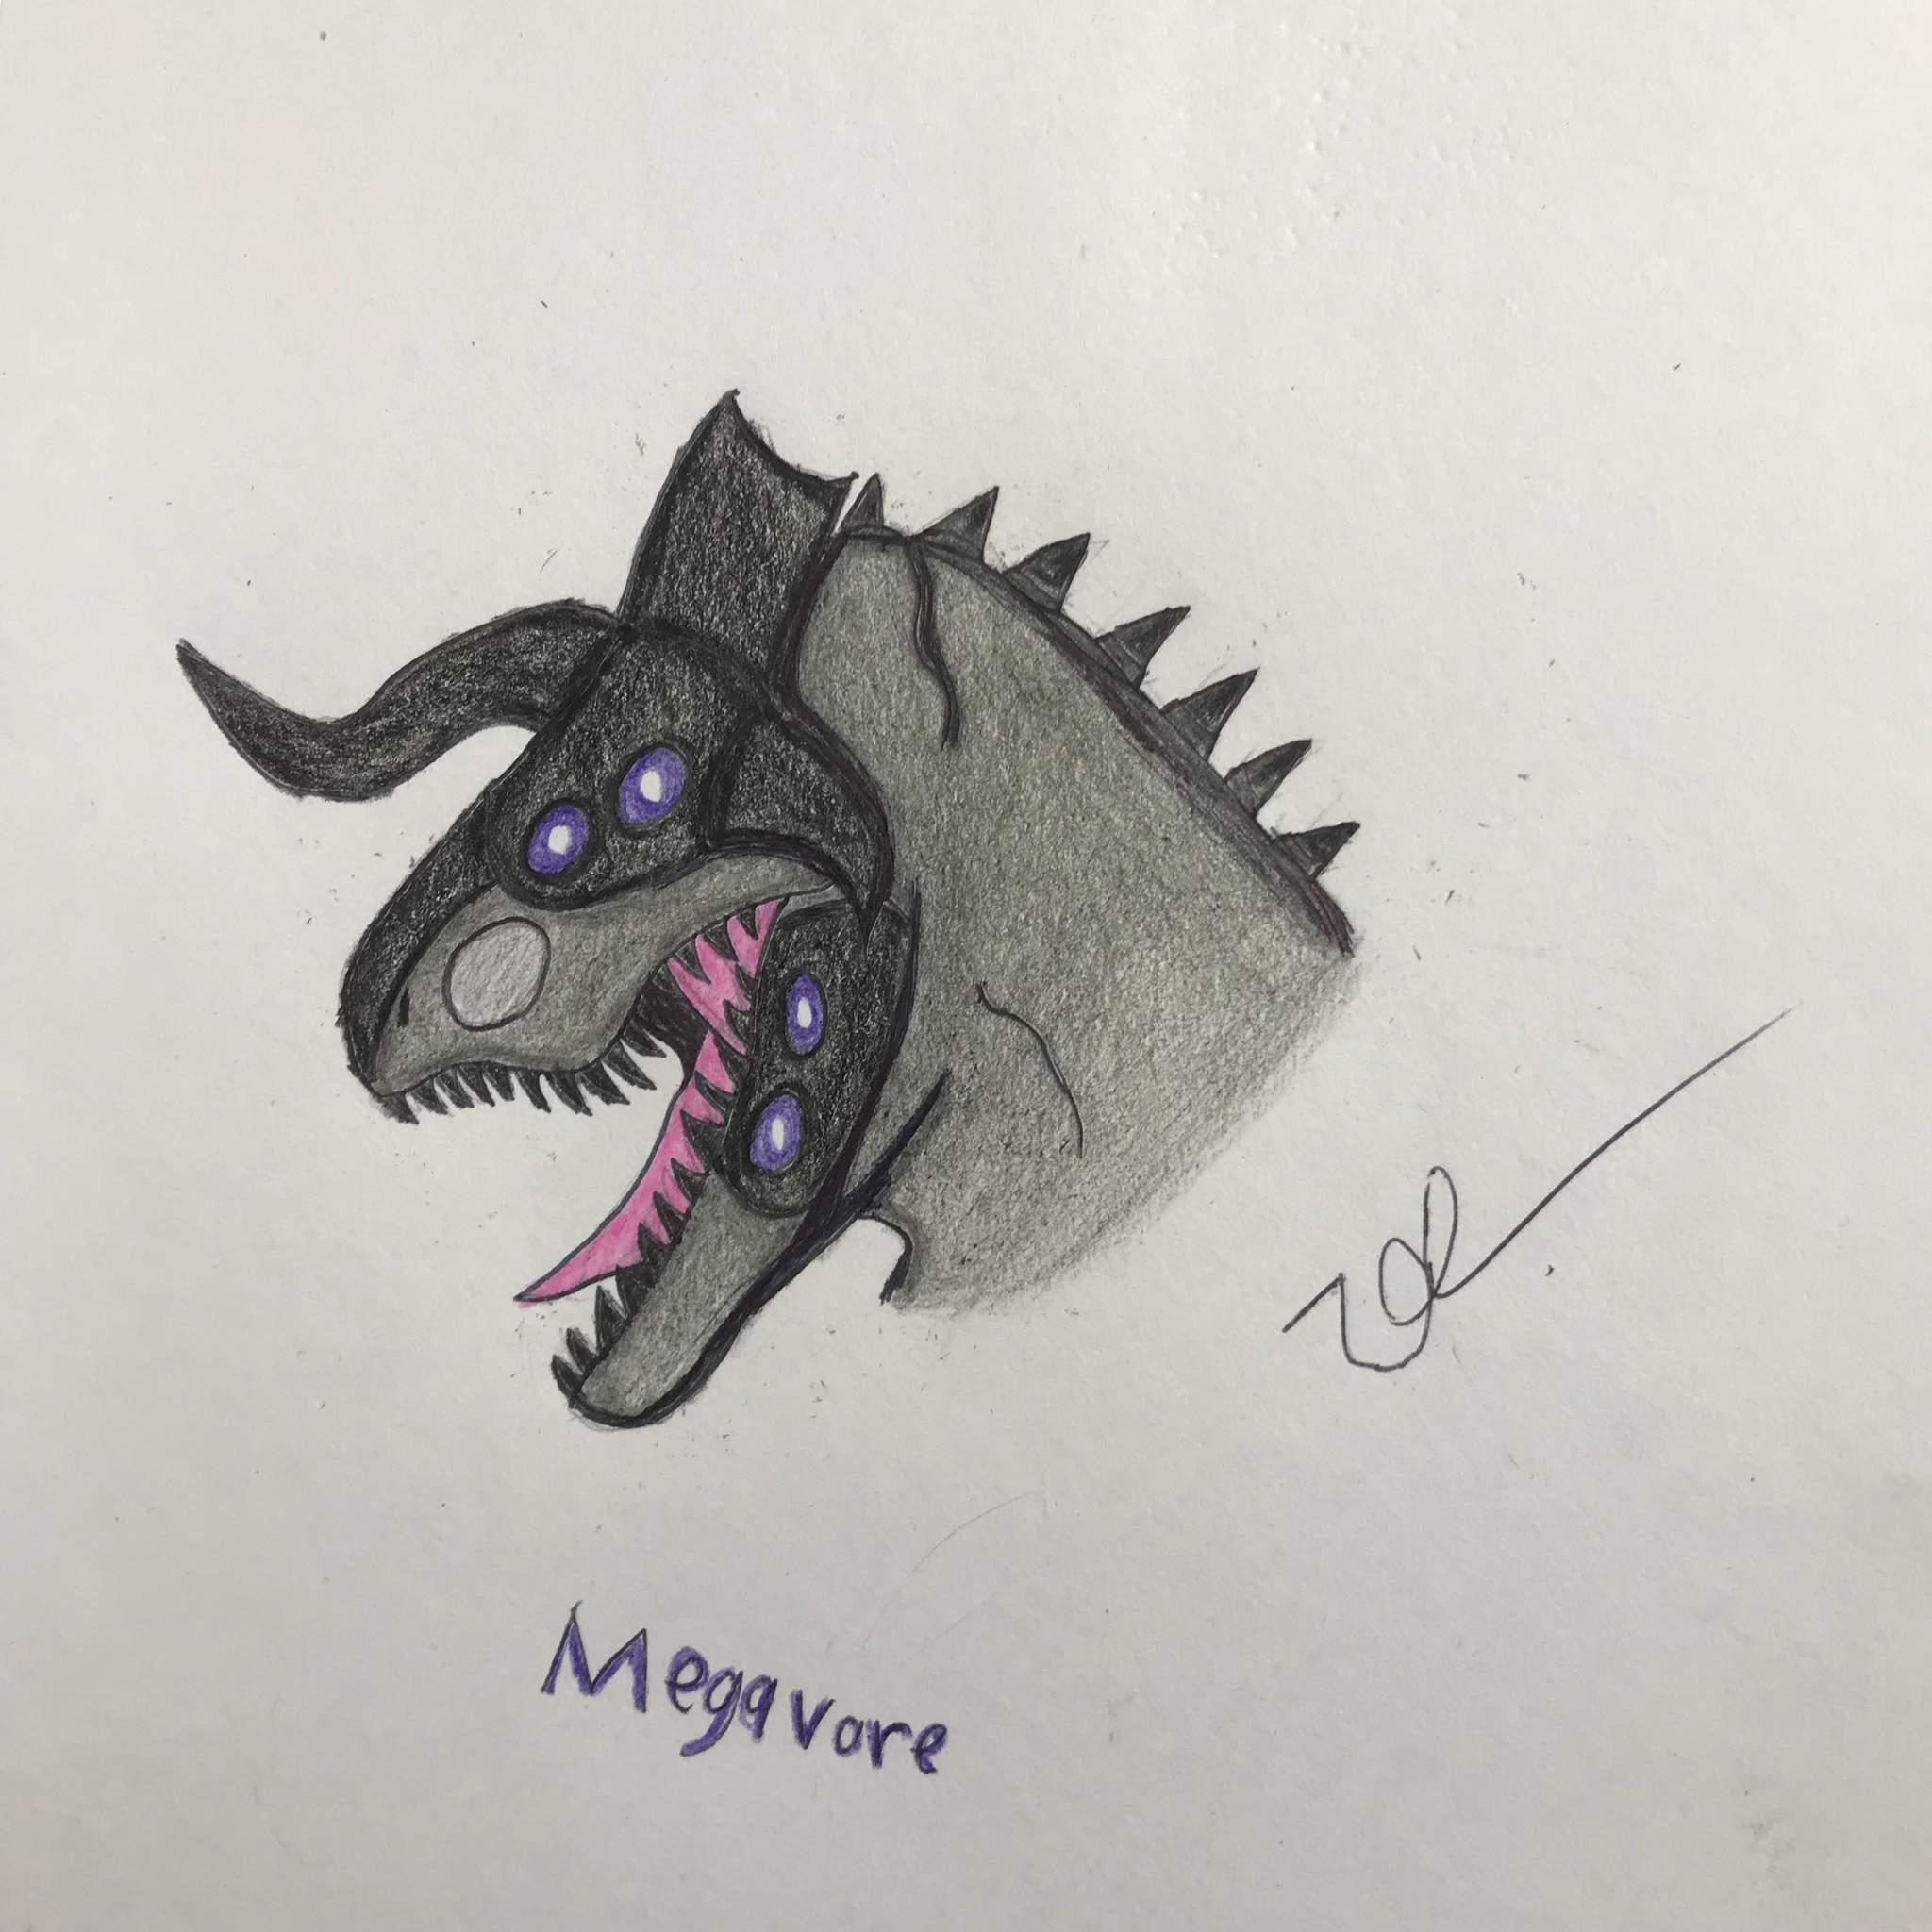 roblox dinosaur simulator how to get megavore